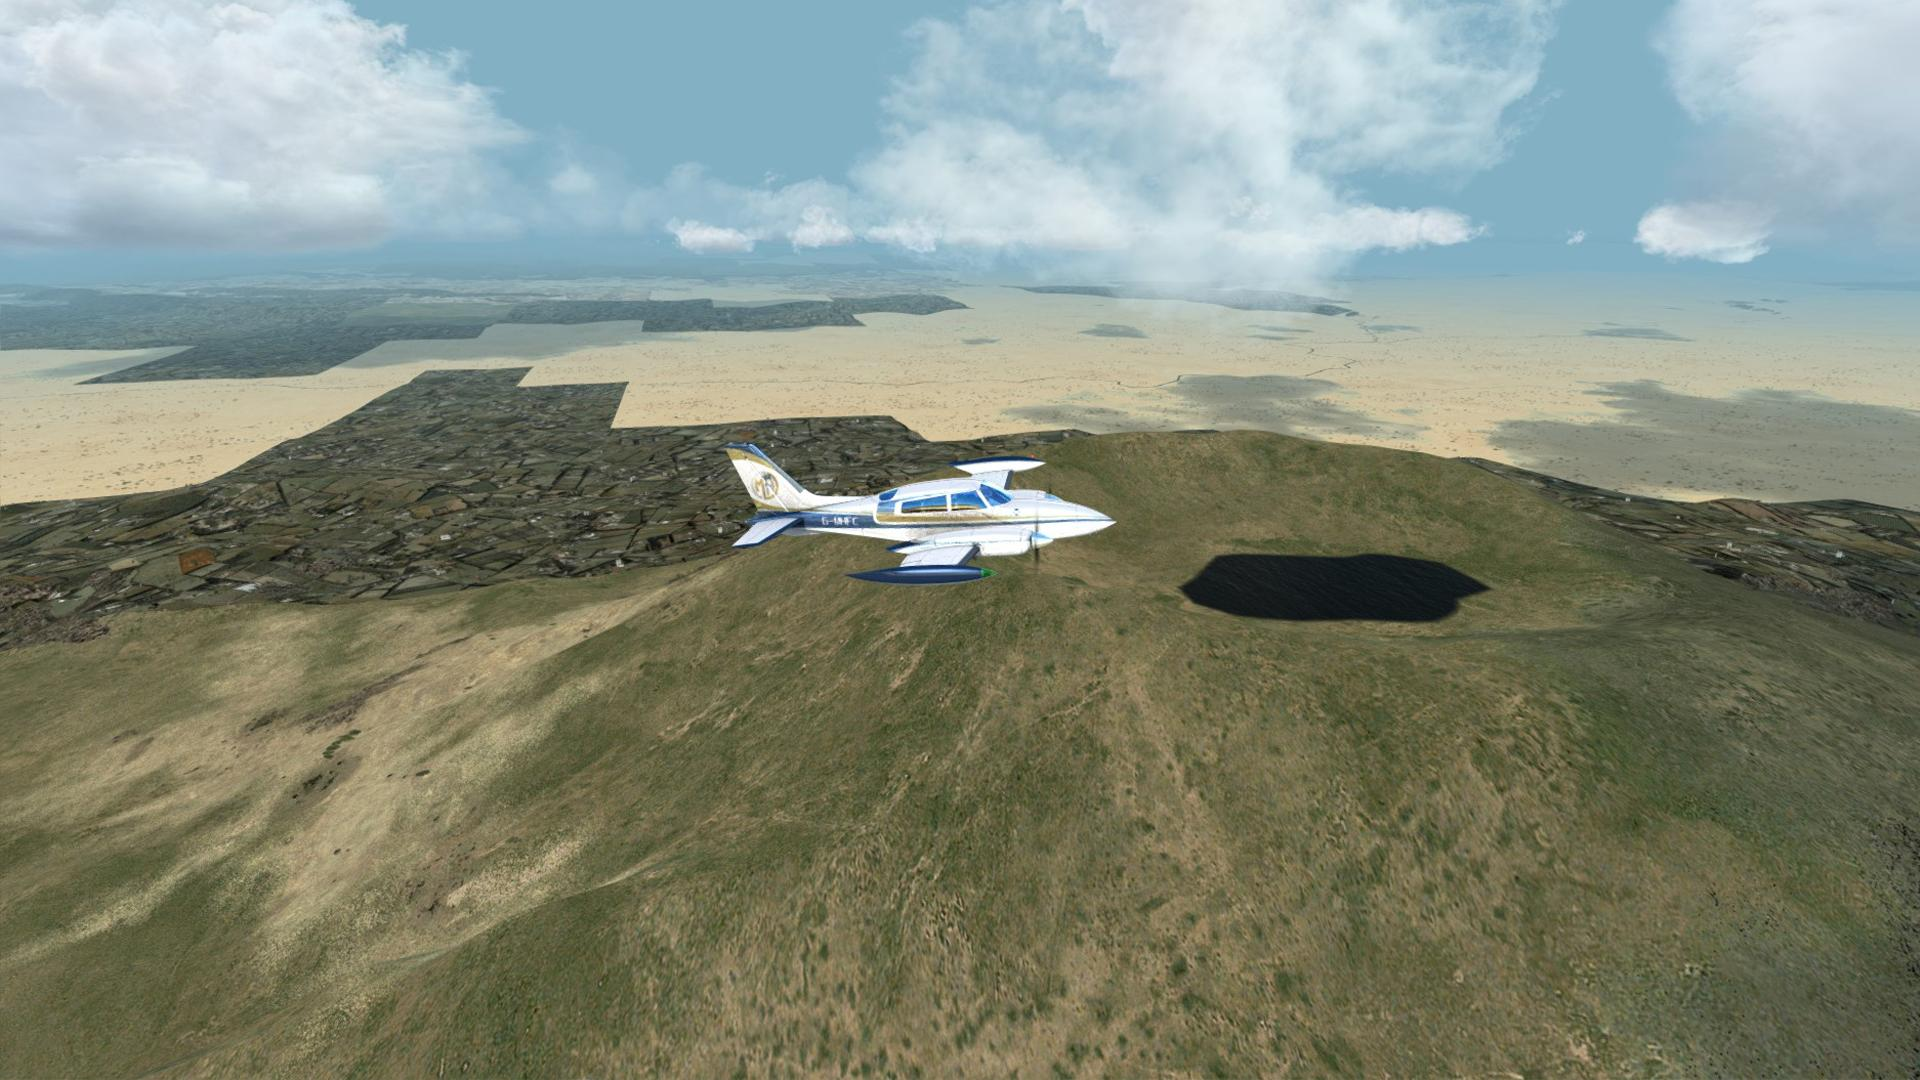 6. Mount_Zuqualla_Ethiopia.jpg